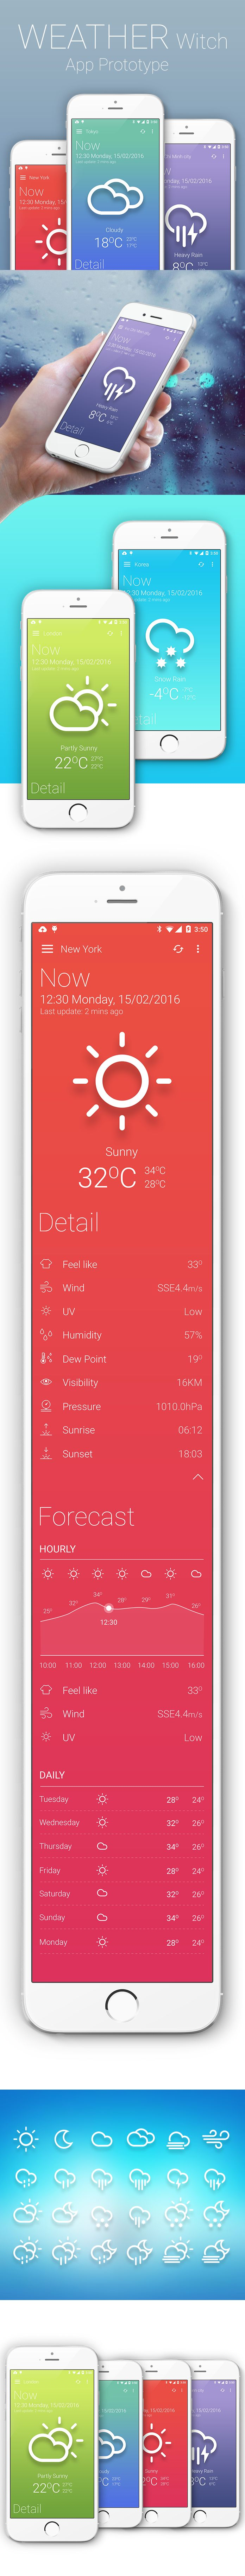 Weather witch app prototype on Behance